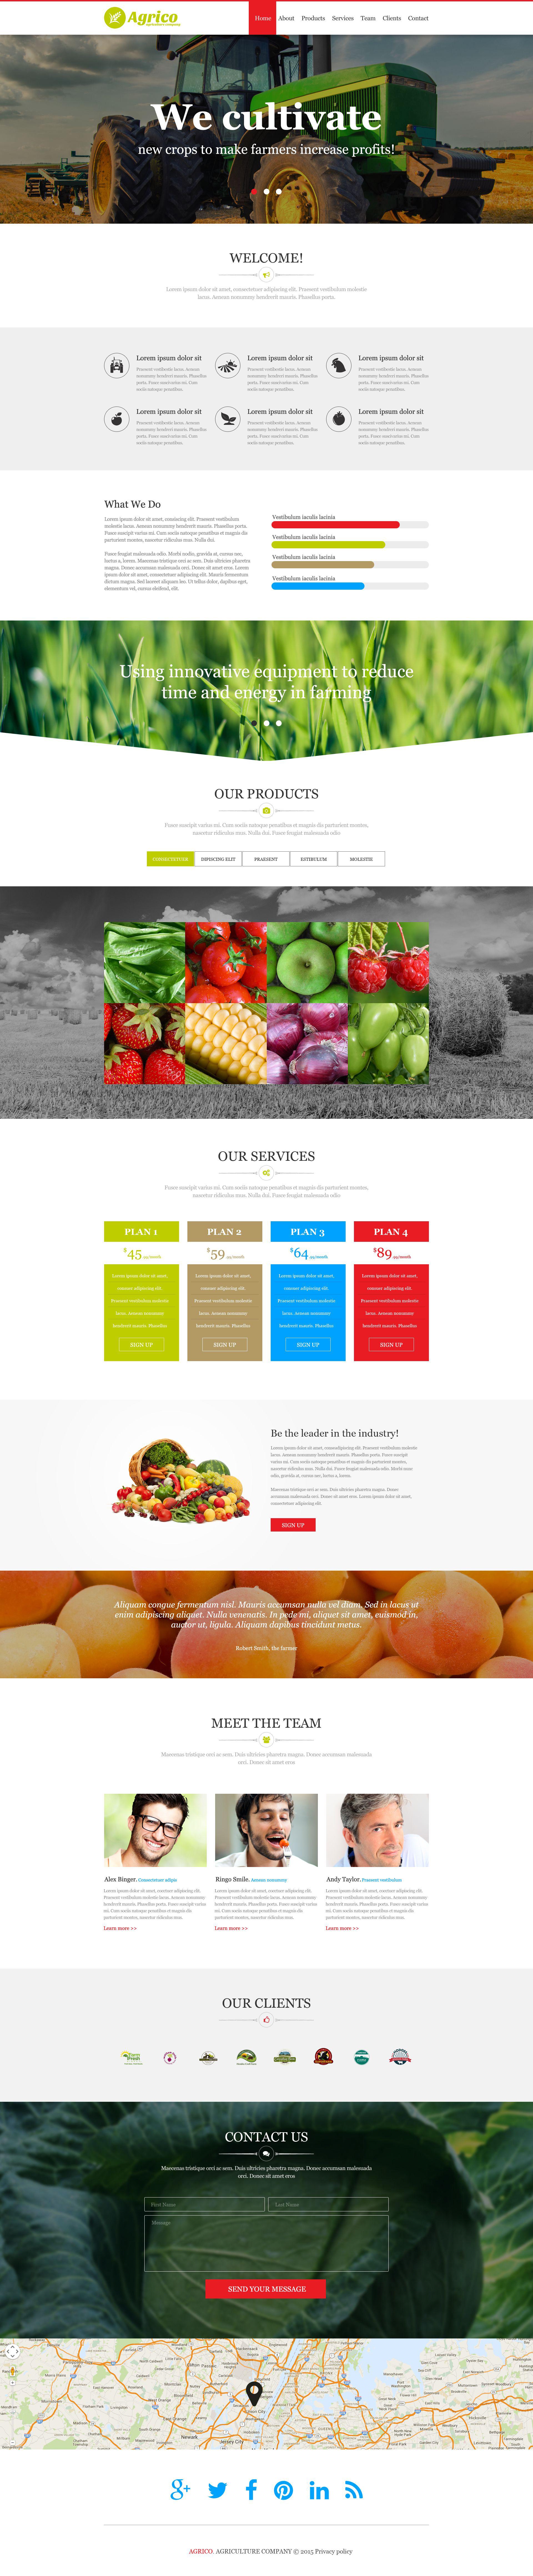 Template Muse para Sites de Agricultura №52629